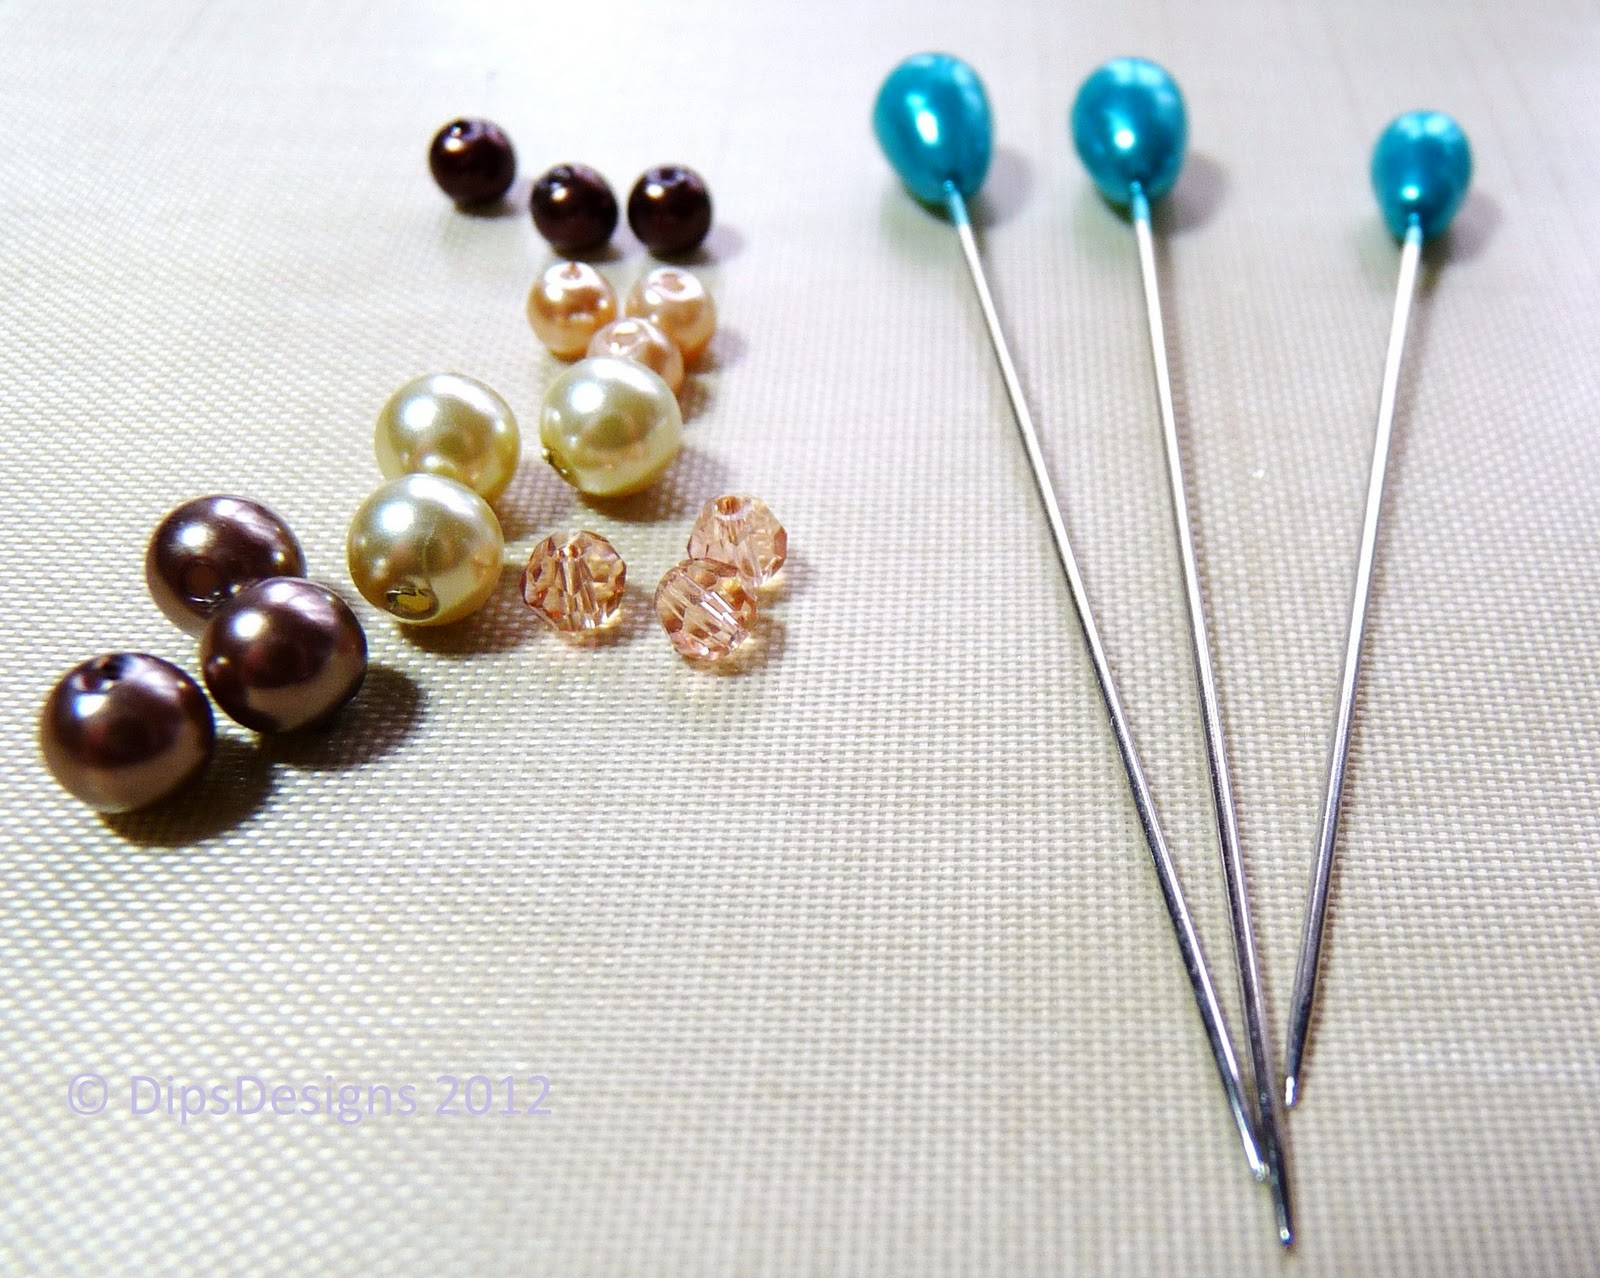 Dipsdesigns Creating Hatpins